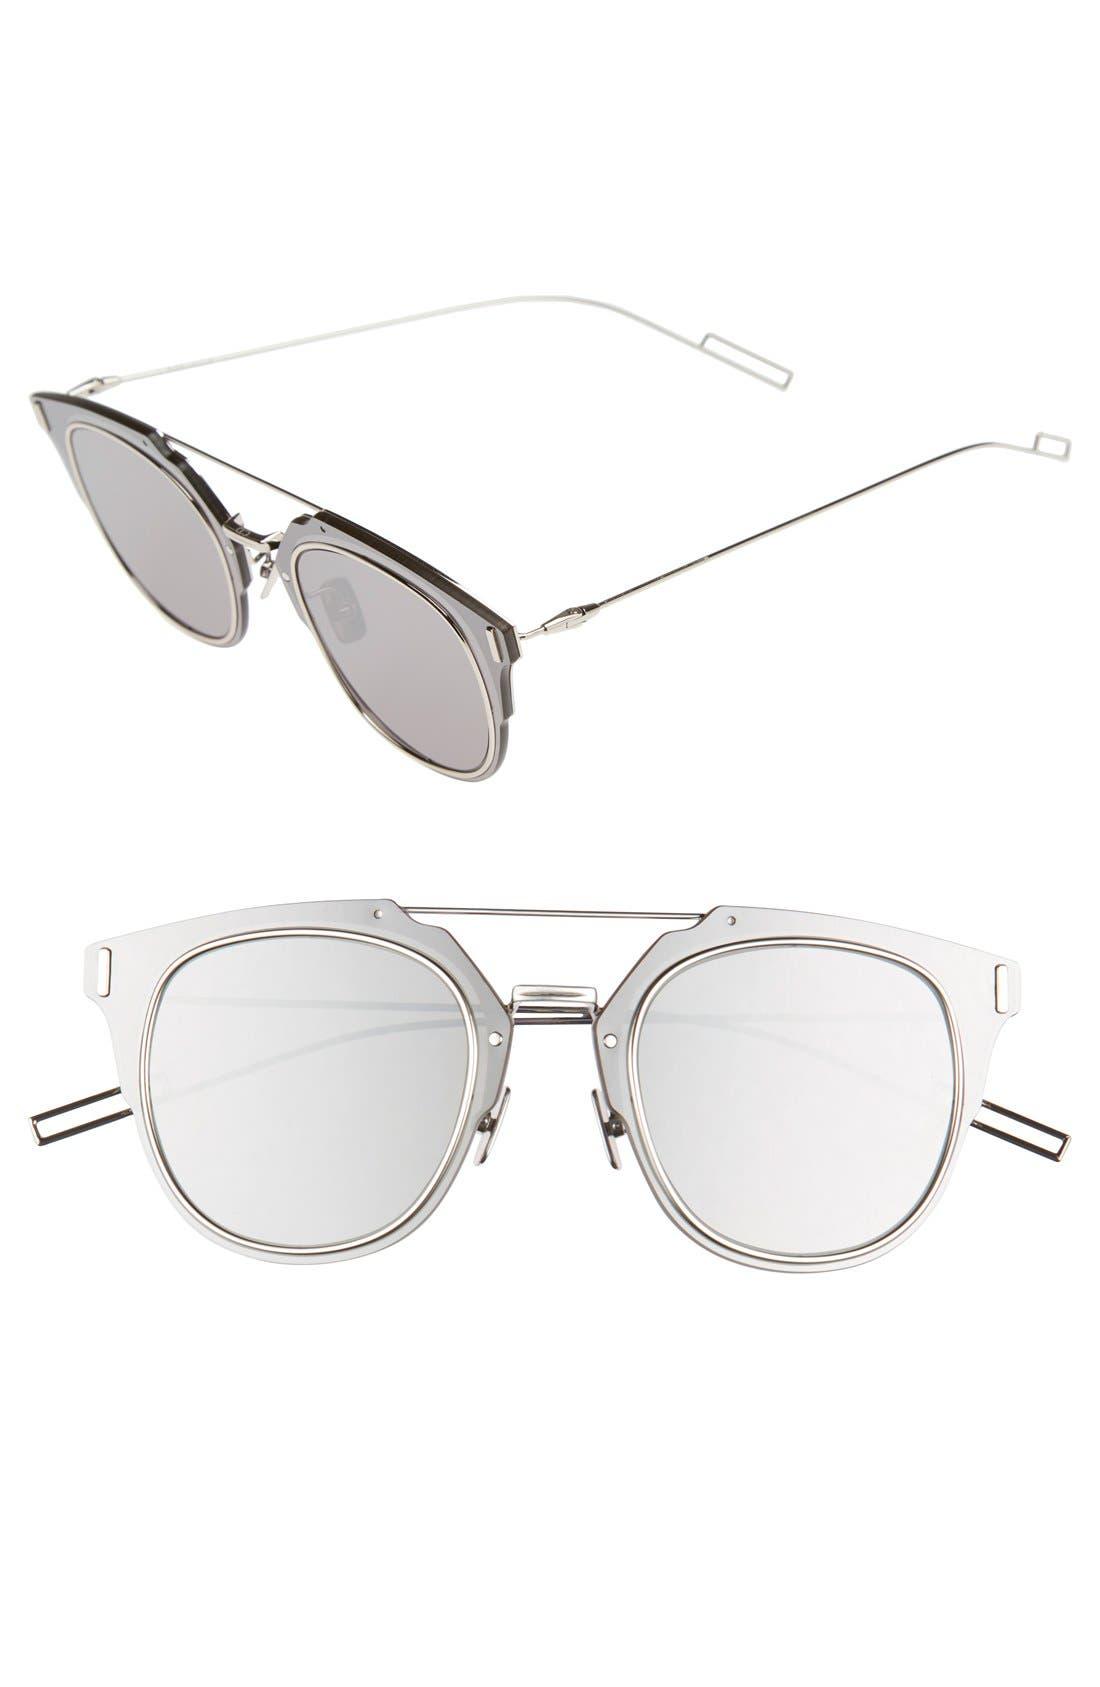 'Composit 1.0S' 62mm Metal Shield Sunglasses,                             Main thumbnail 1, color,                             PALLADIUM/ GREY SILVER MIRROR